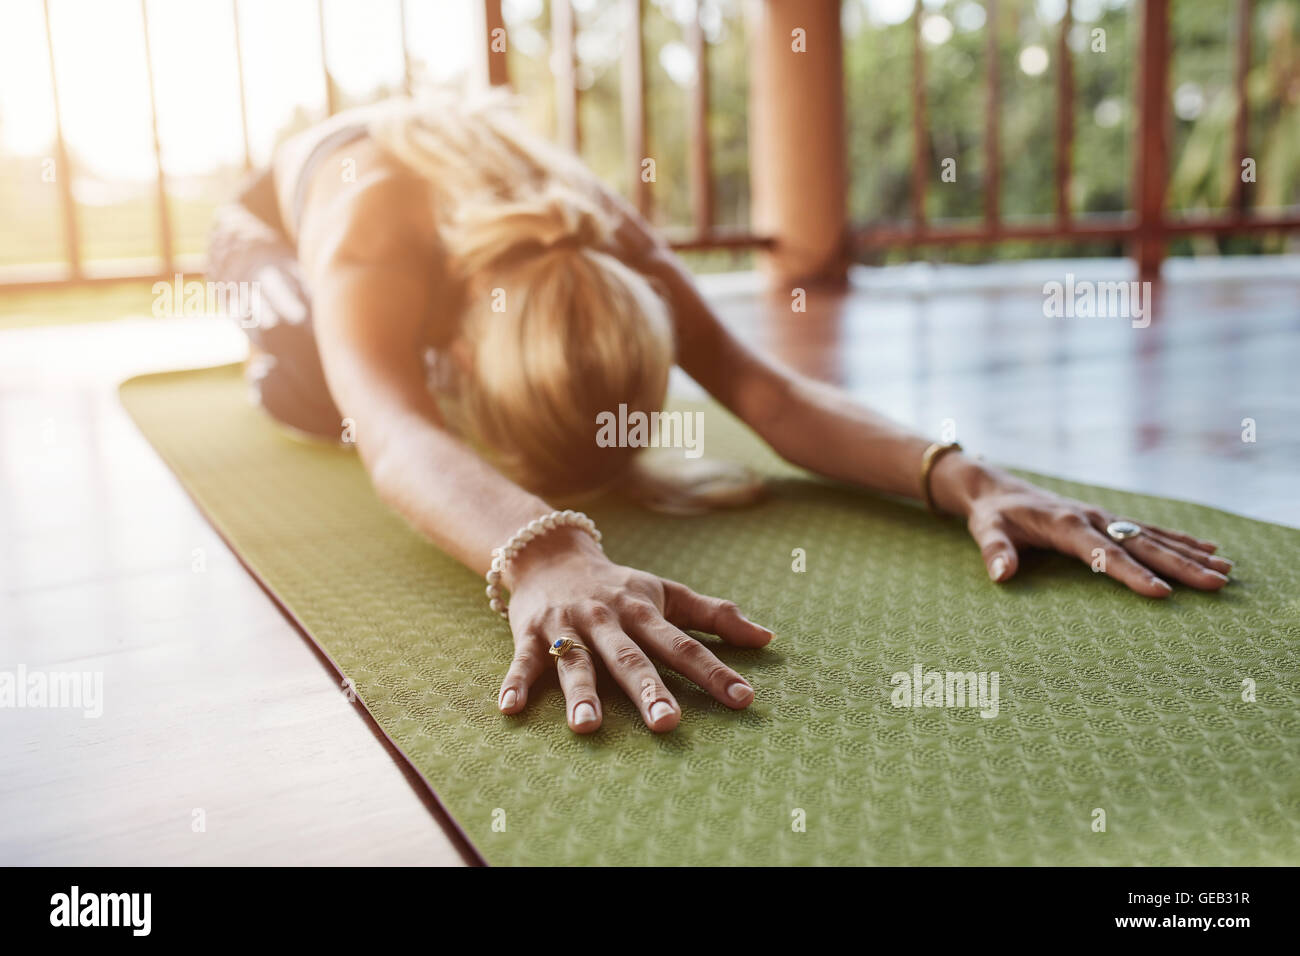 Woman stretching forward, performing a yoga pose on exercise mat. Fitness female performing balasana yoga at gym, - Stock Image